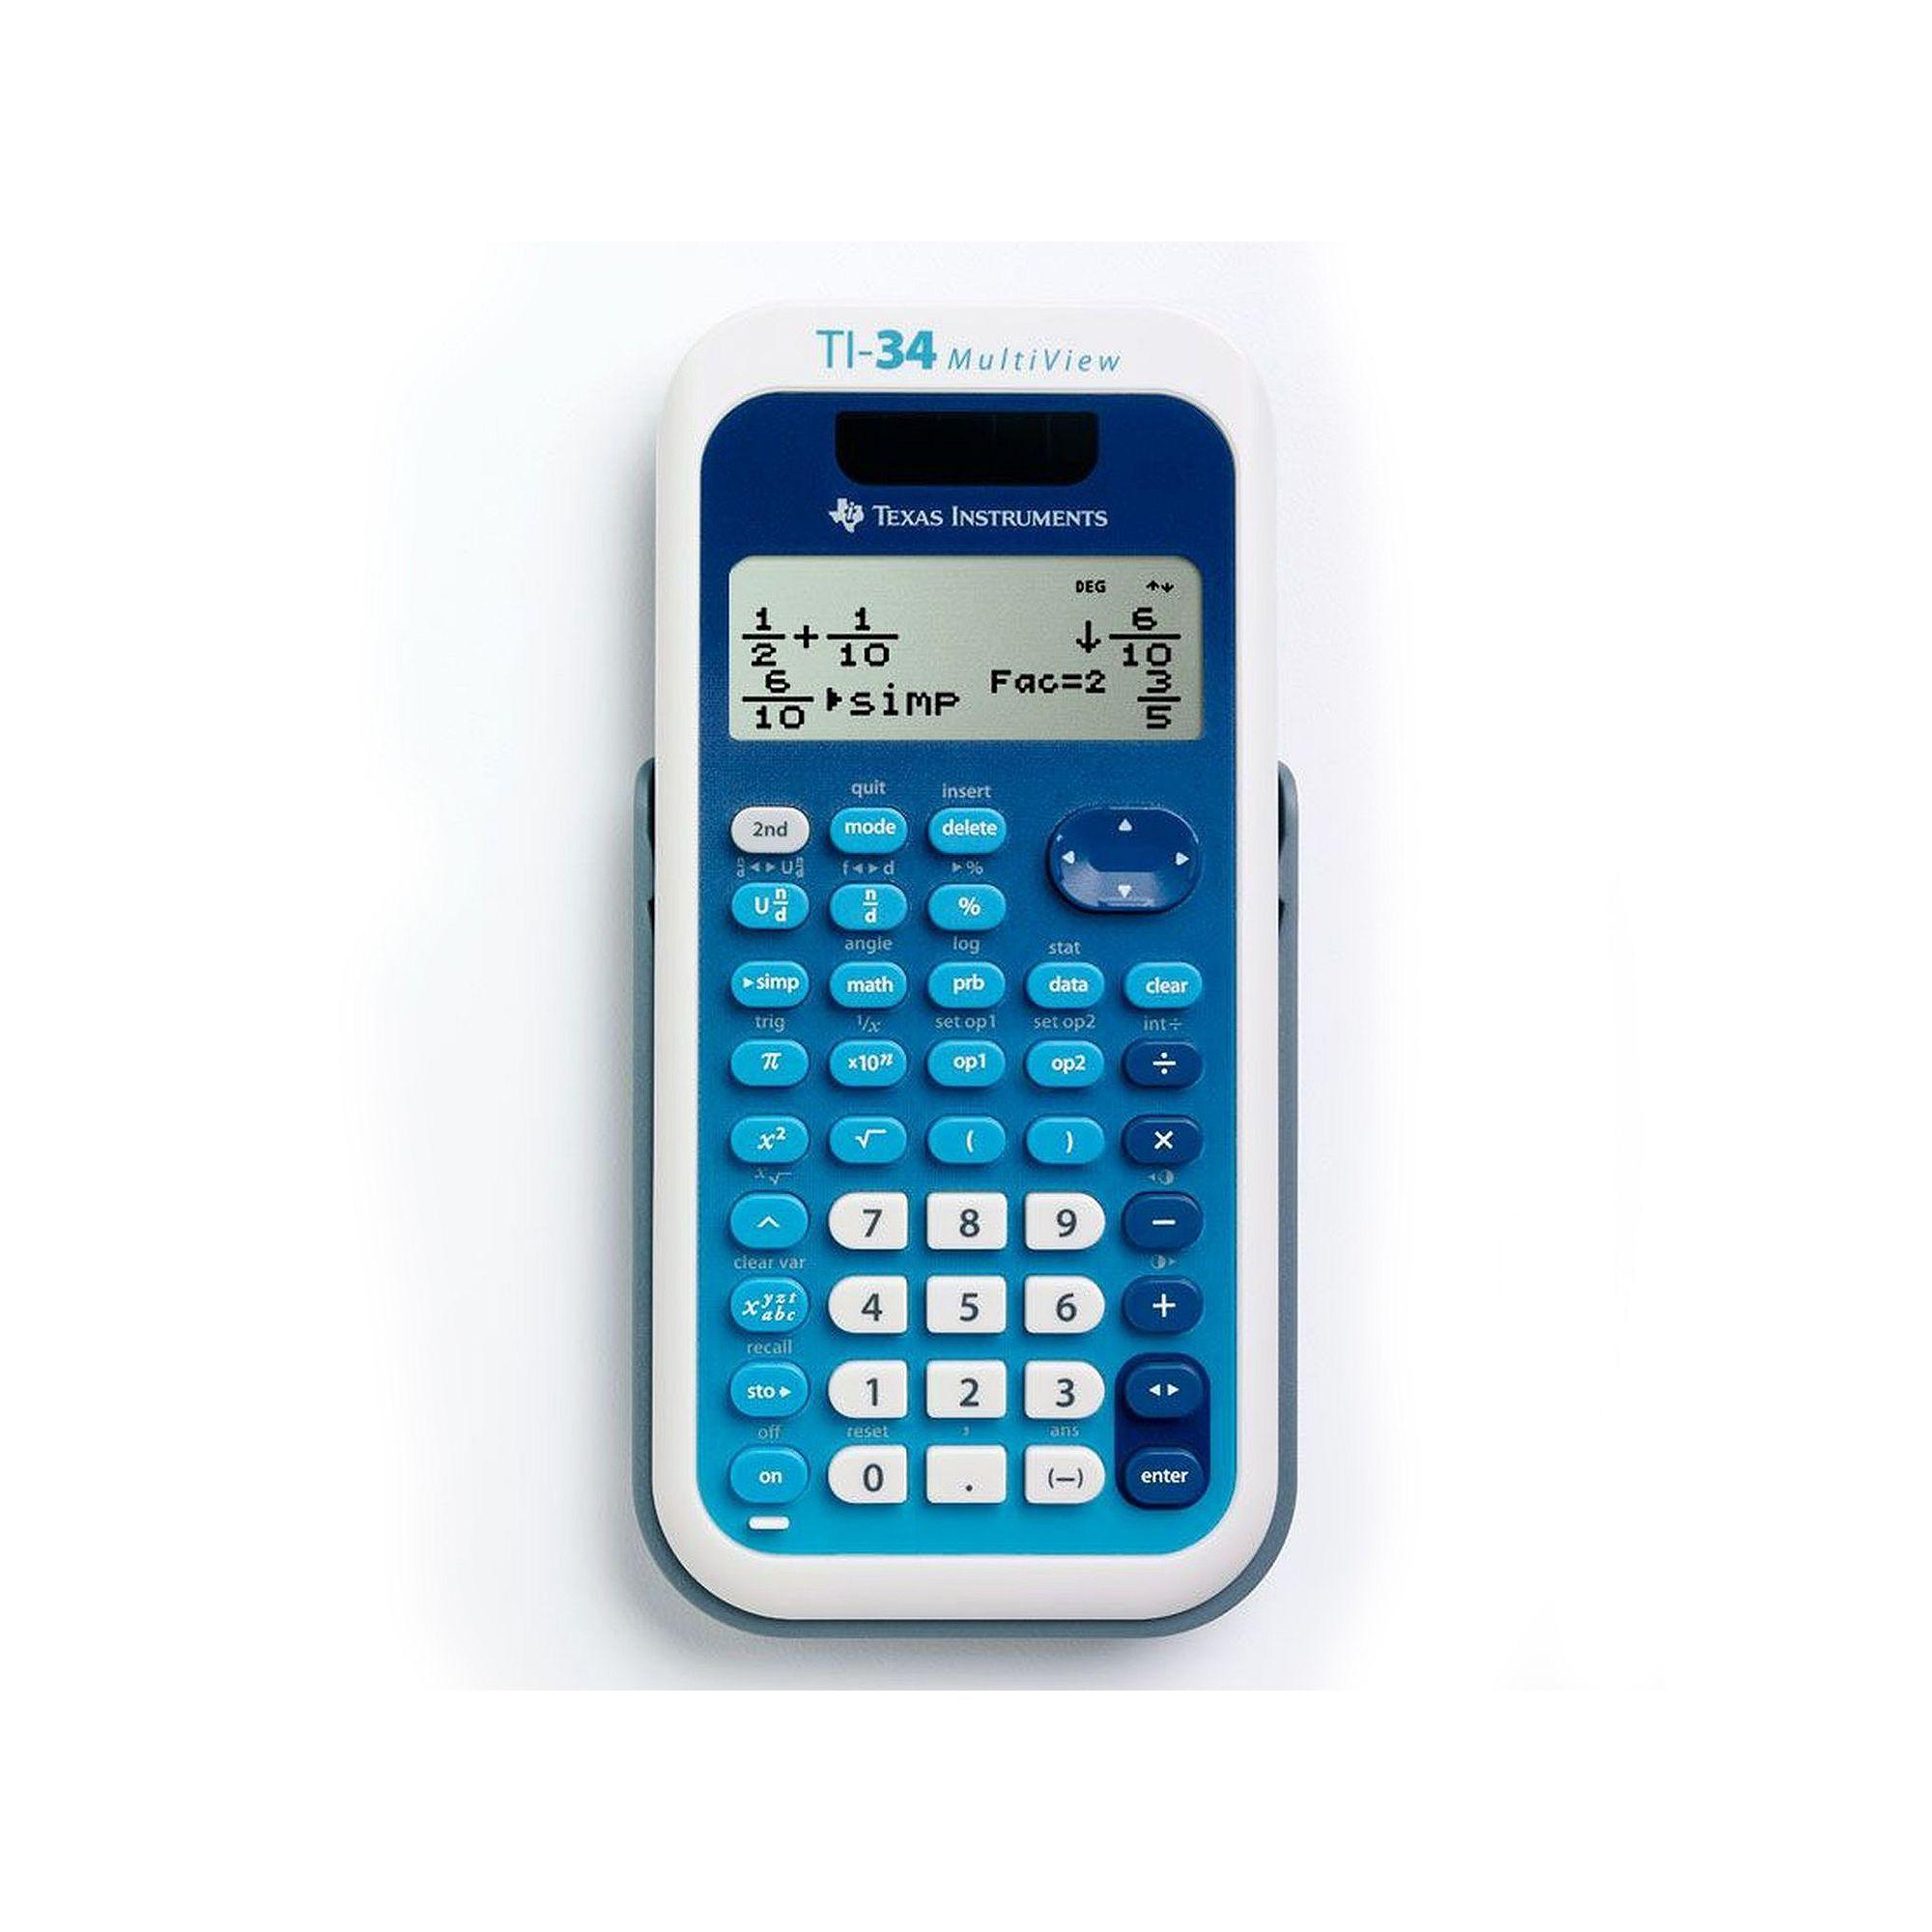 Texas instruments ti 34 multi view calculator multicolor texas instruments ti 34 multi view calculator multicolor falaconquin